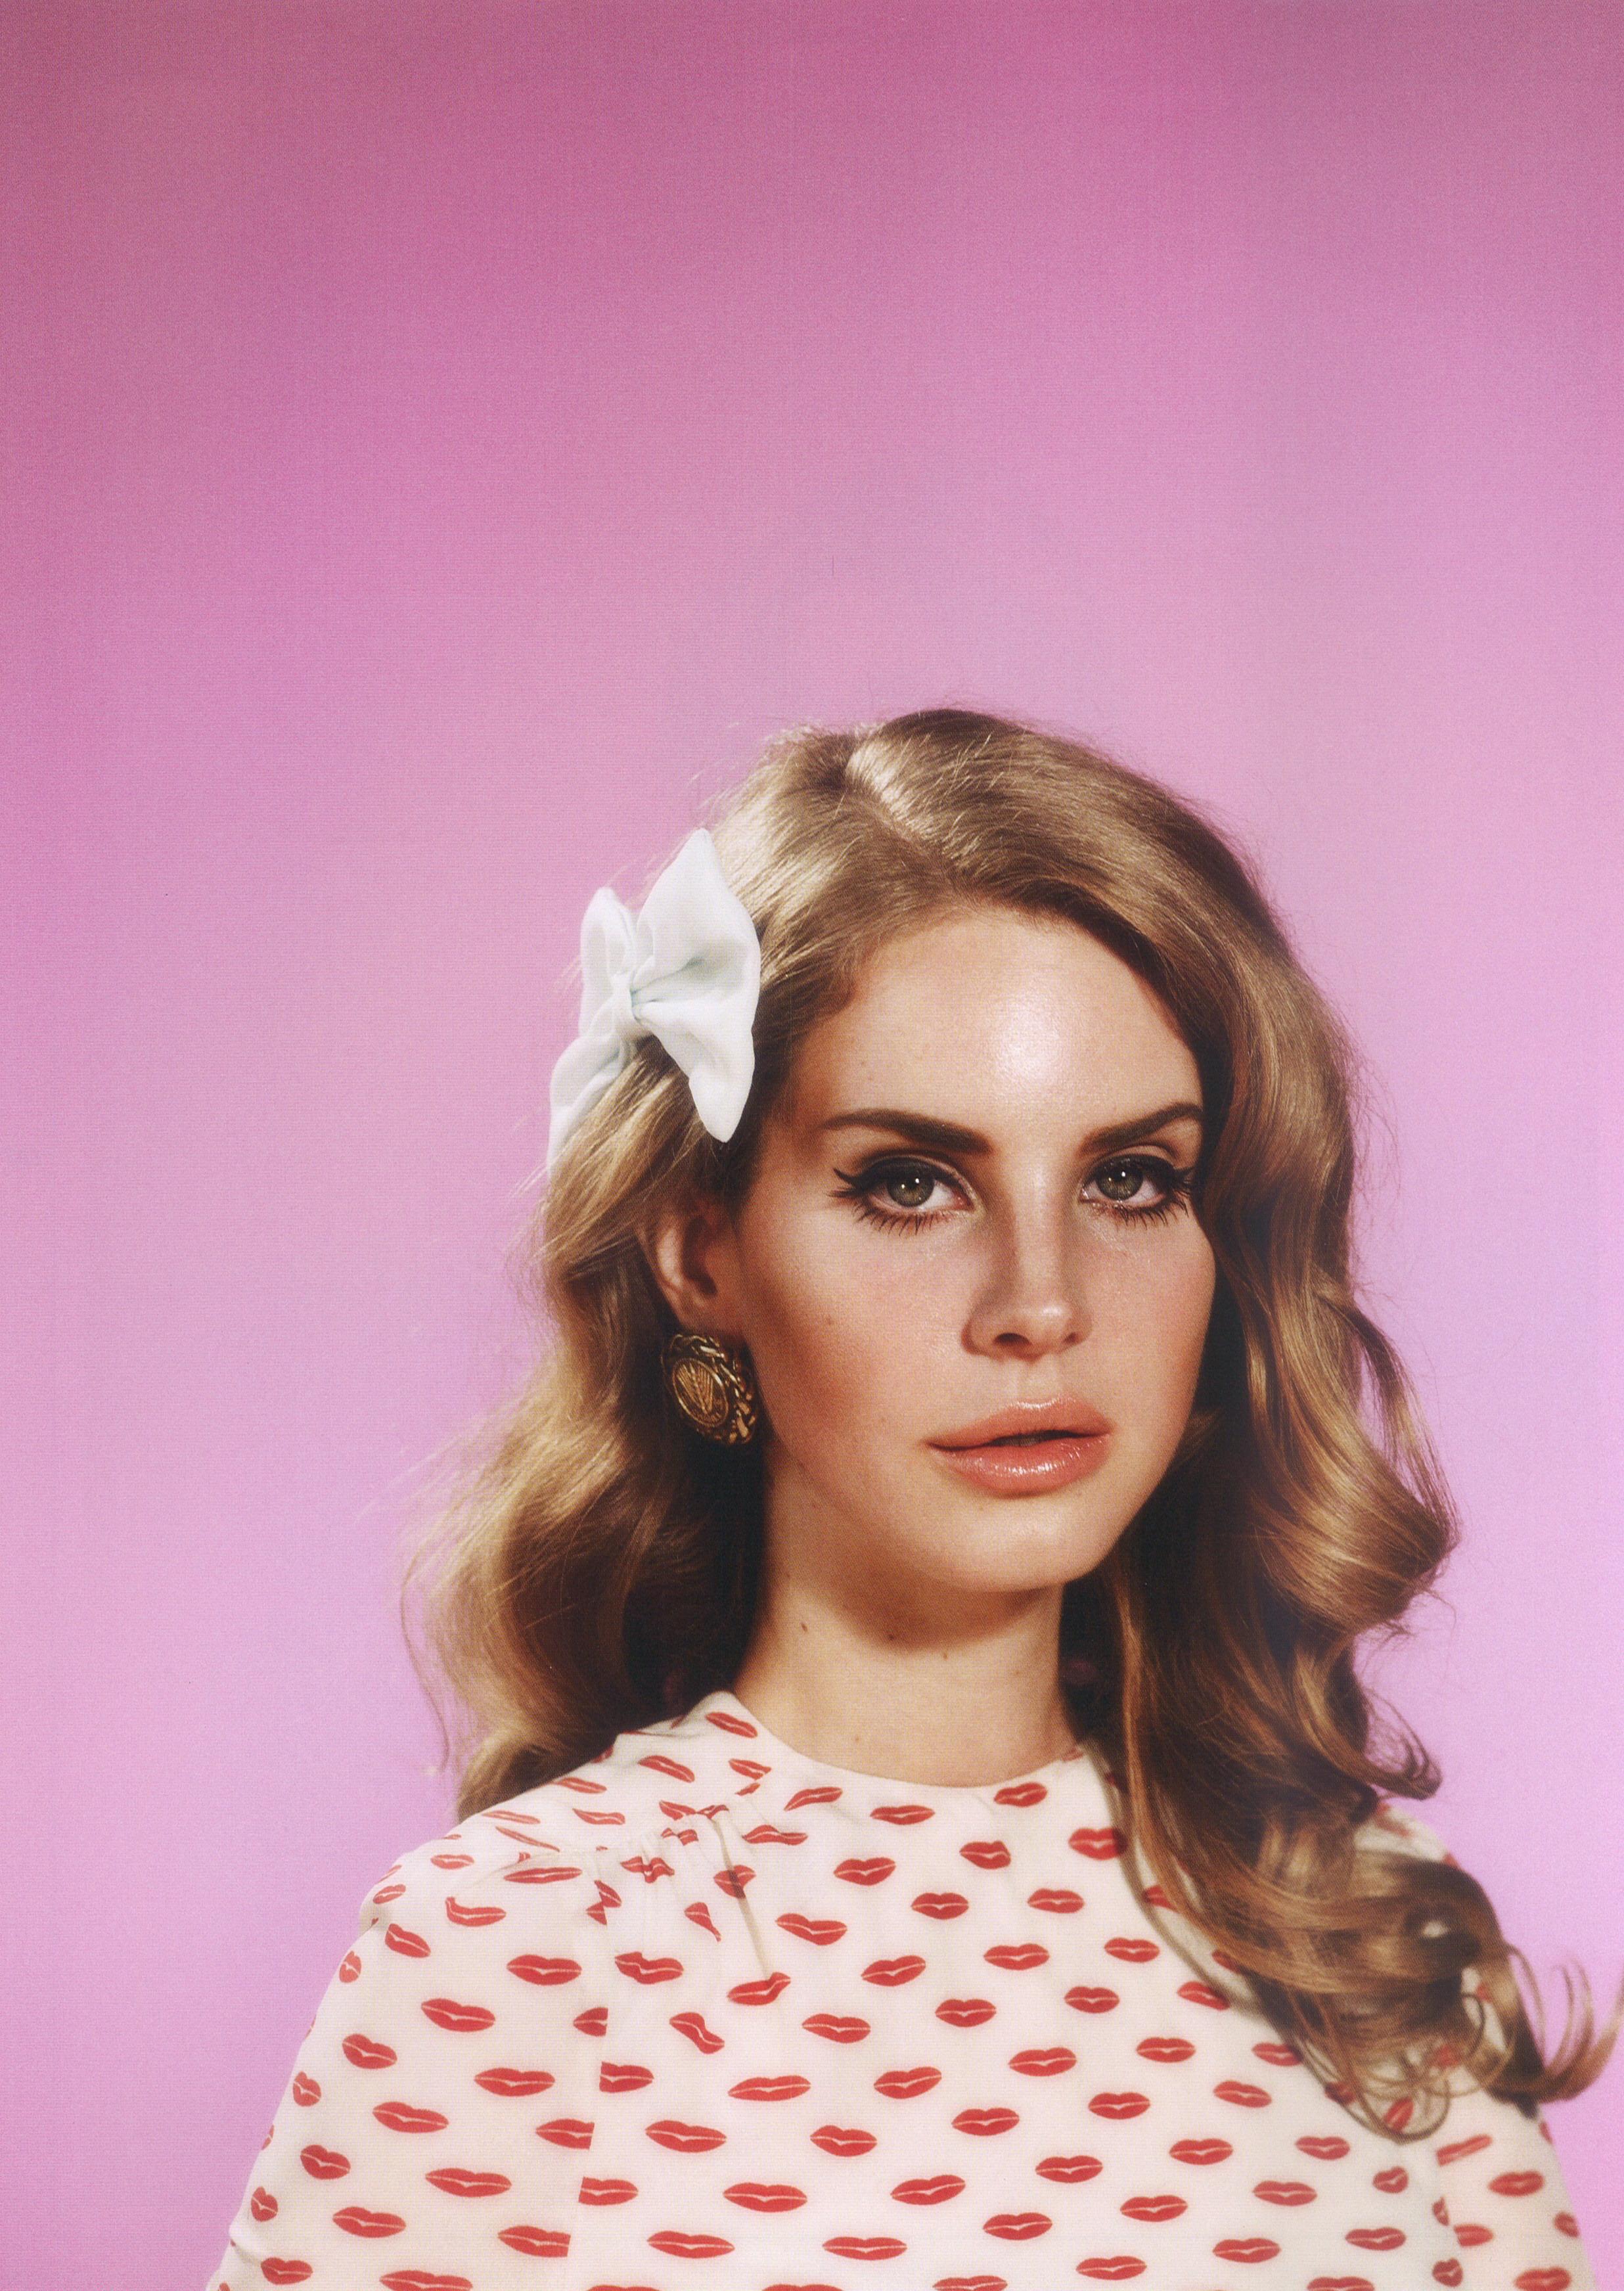 Lana Del Rey By Chris Nicholls For Fashion Magazine: Claireverity